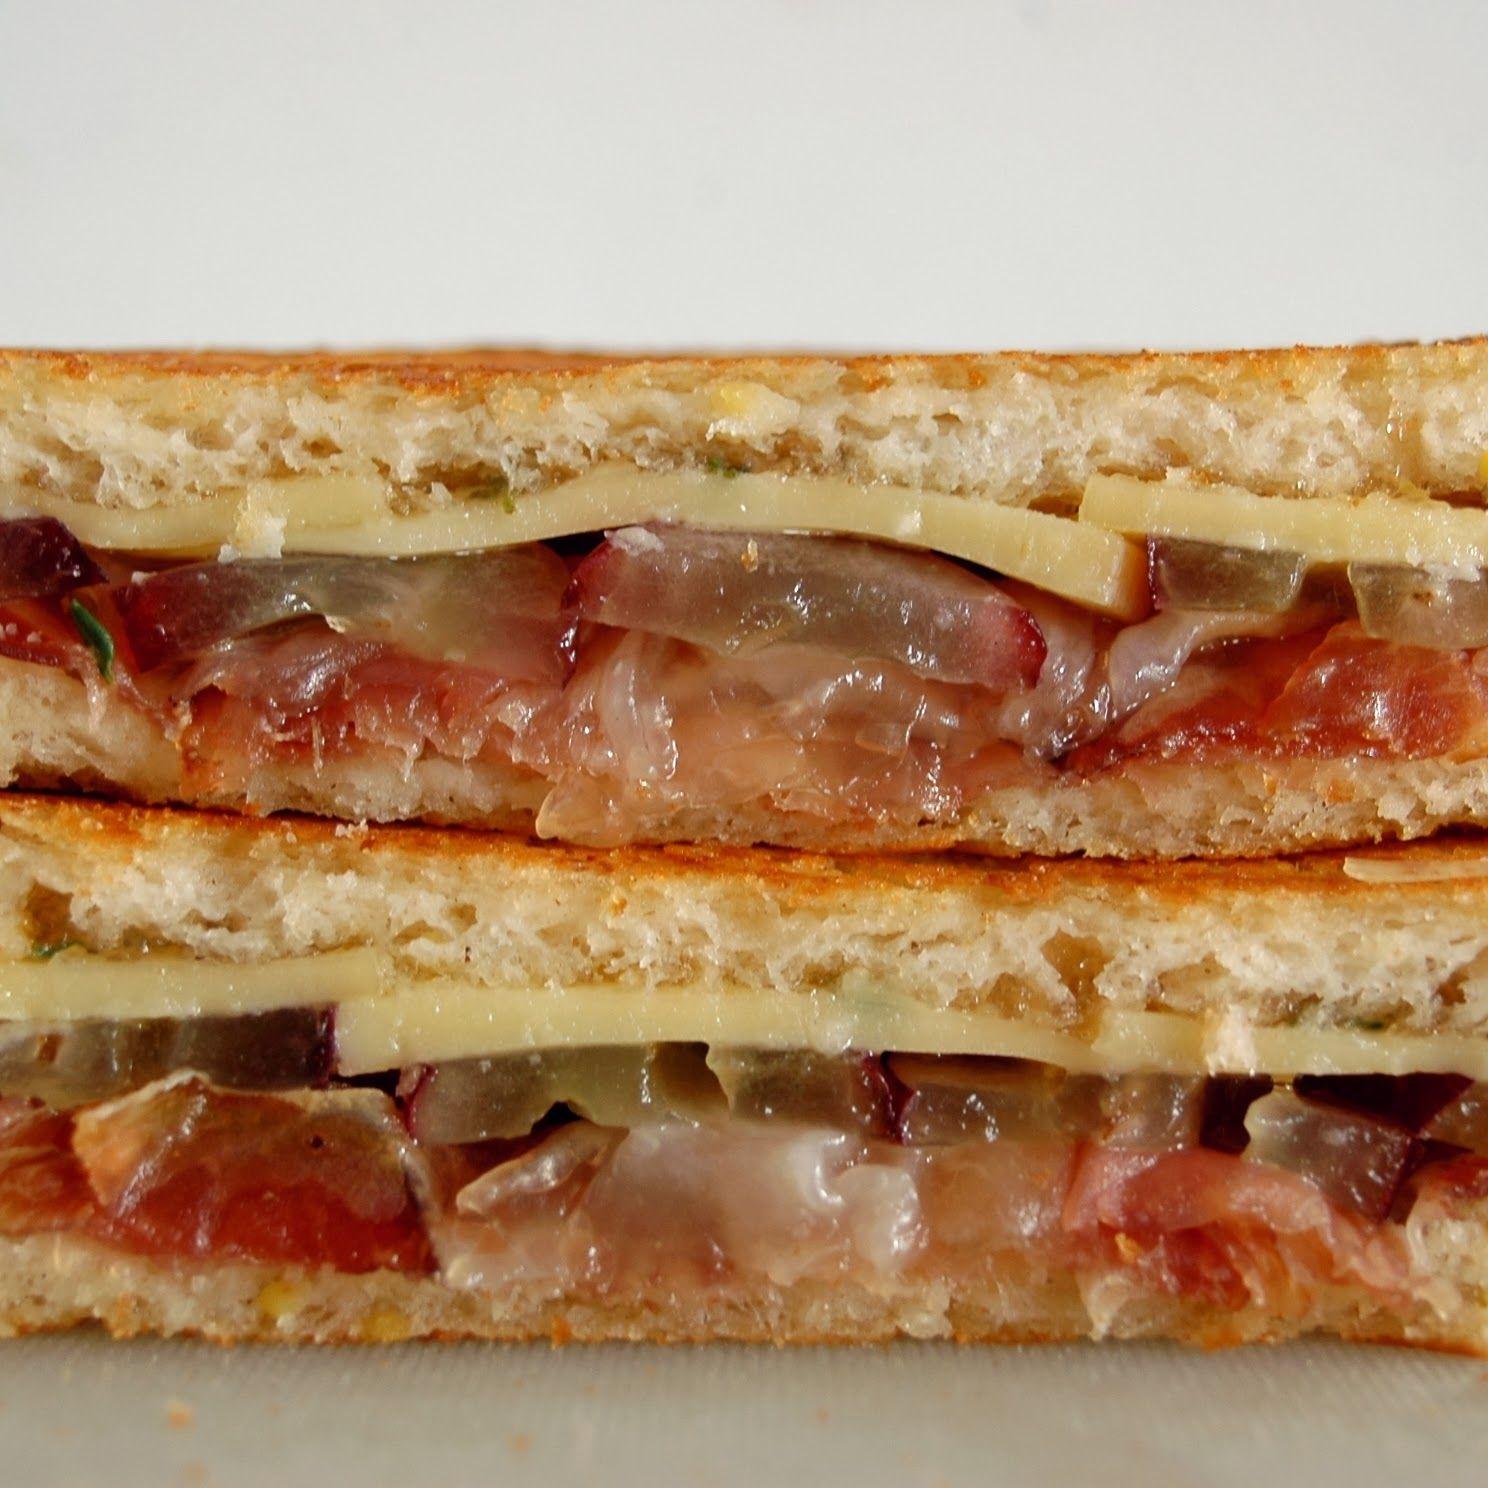 closeup, prosciuotto, grapes, cheese, gruyere, thyme, bergamot, gluten free, sandwich, sandwich porn, foodporn, food, food blog, glorious sandwiches